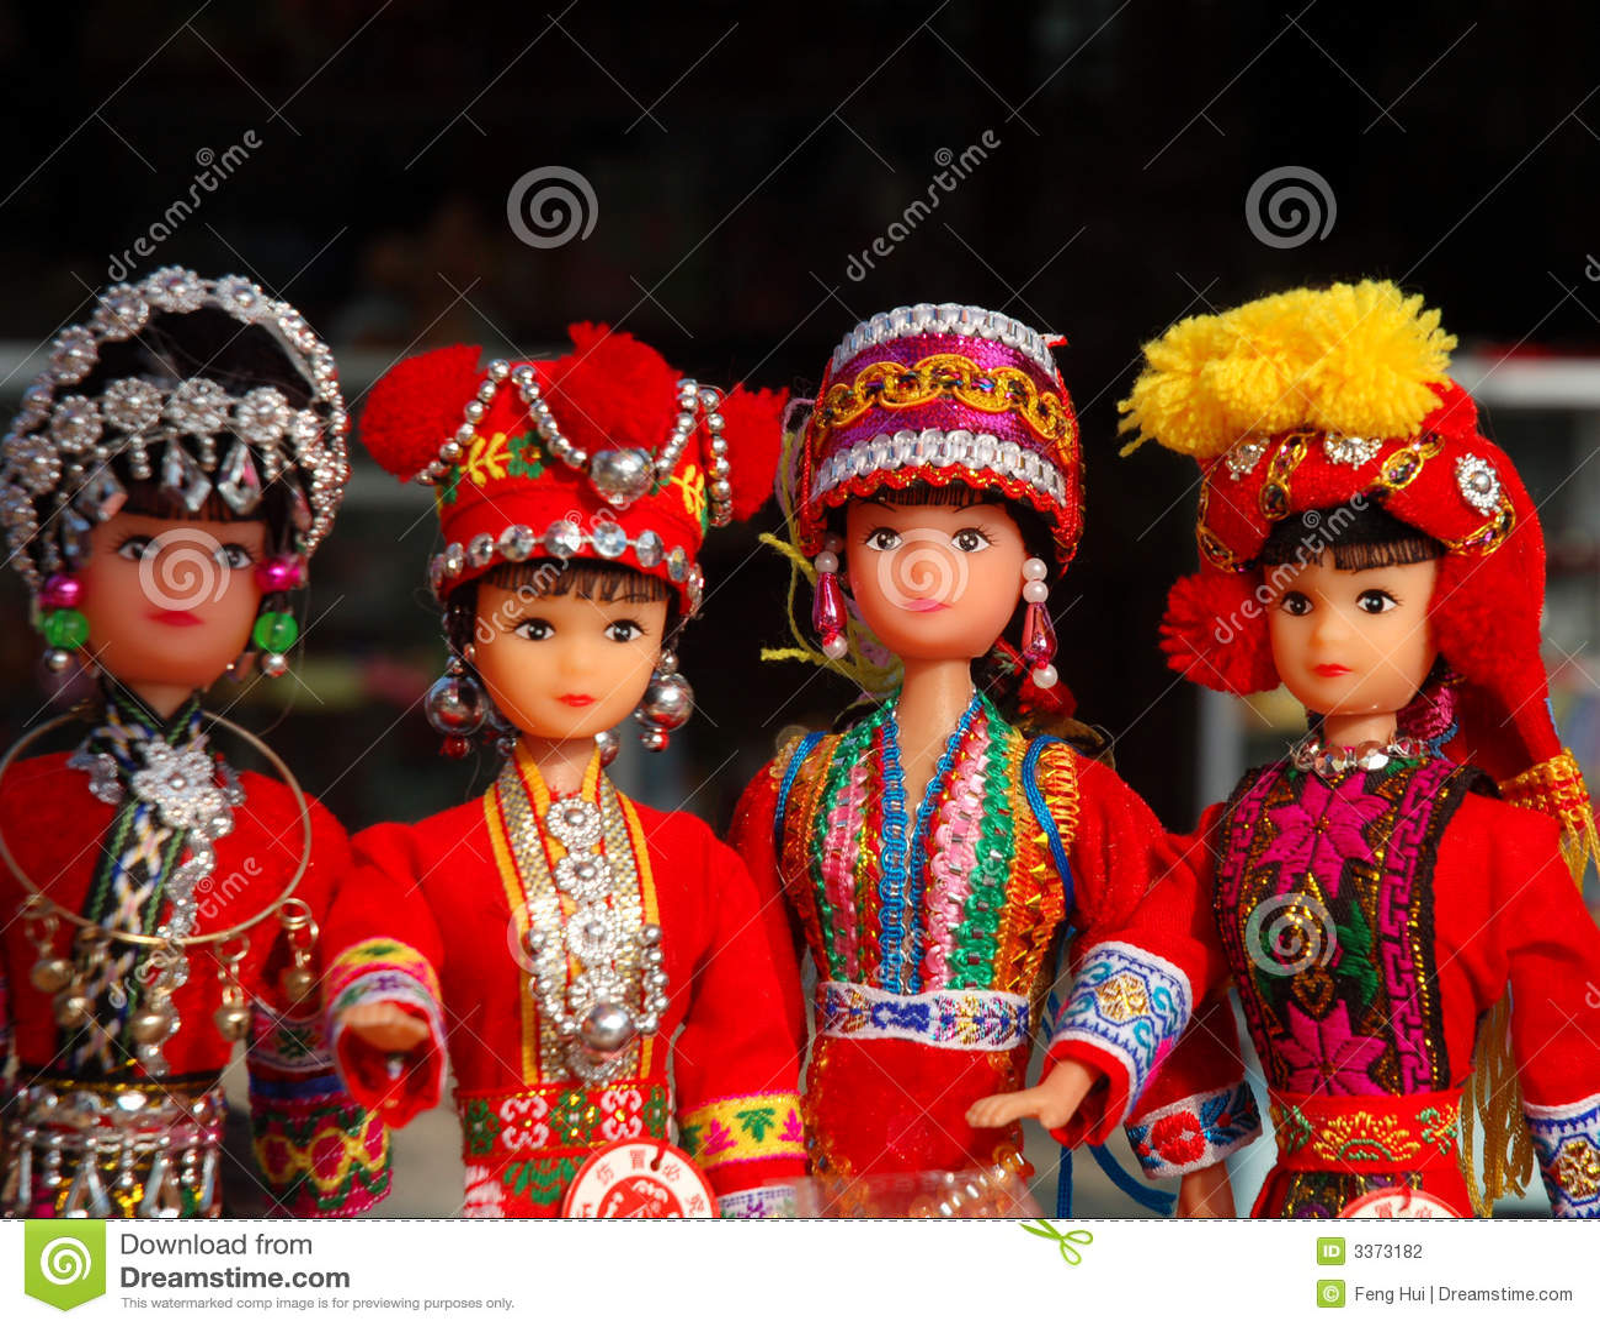 Toys For Minorities : Minority stock photography image